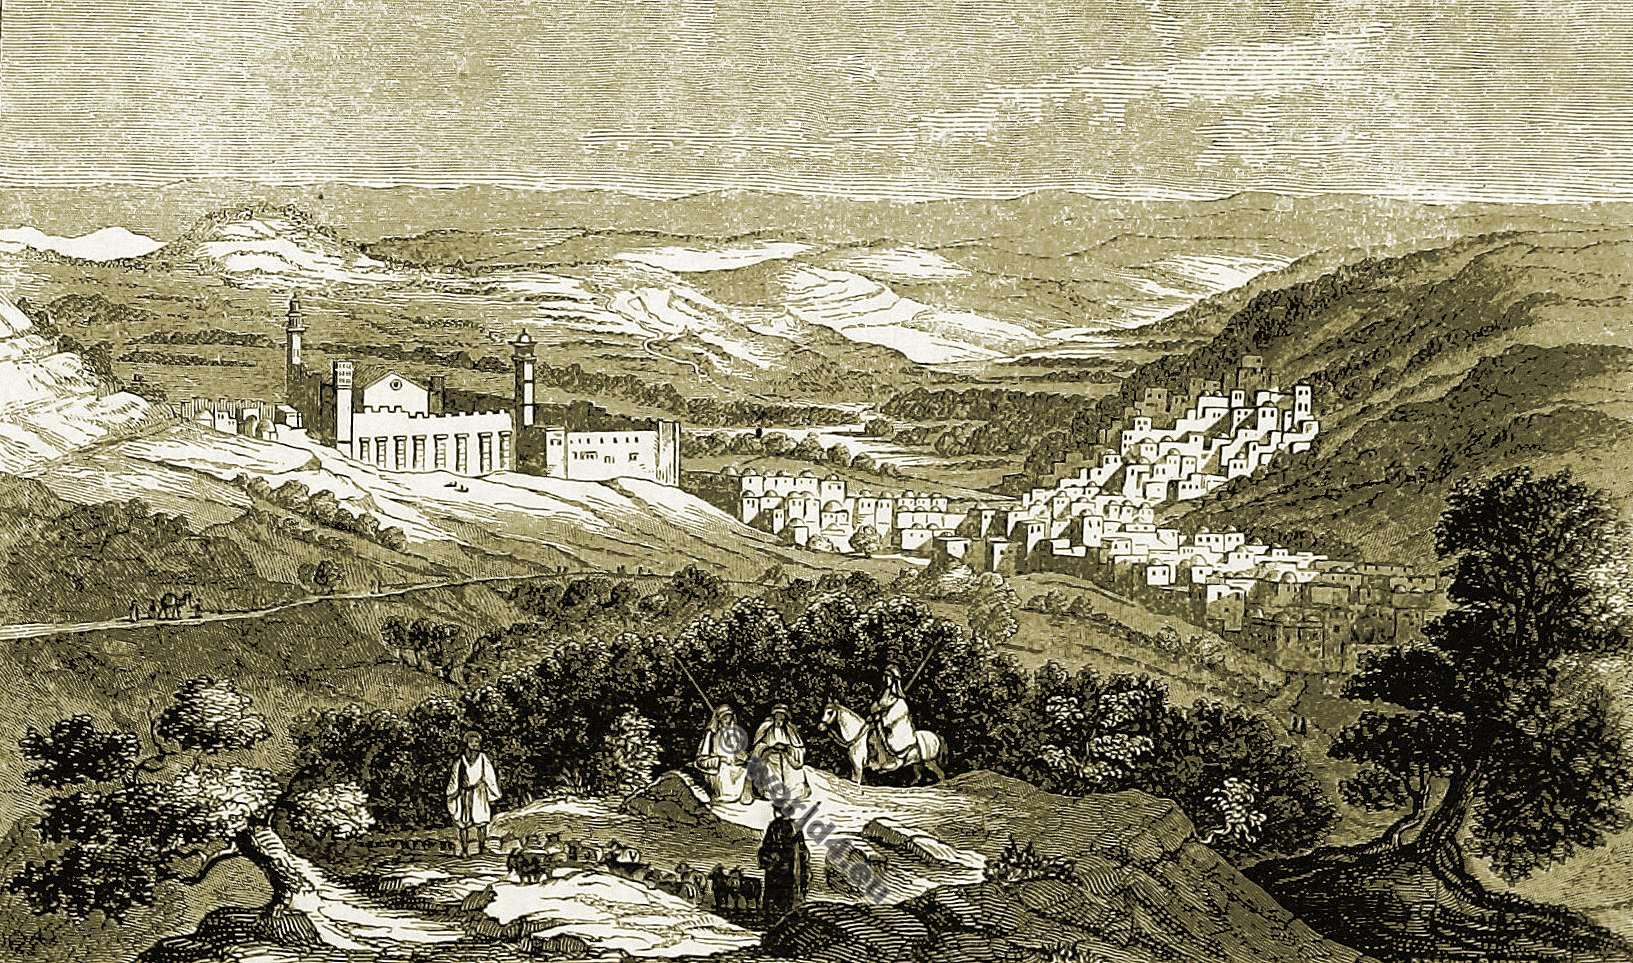 Hebron, Cave, Machpelah, Ibrahimi Mosque, ancient, Jewish,